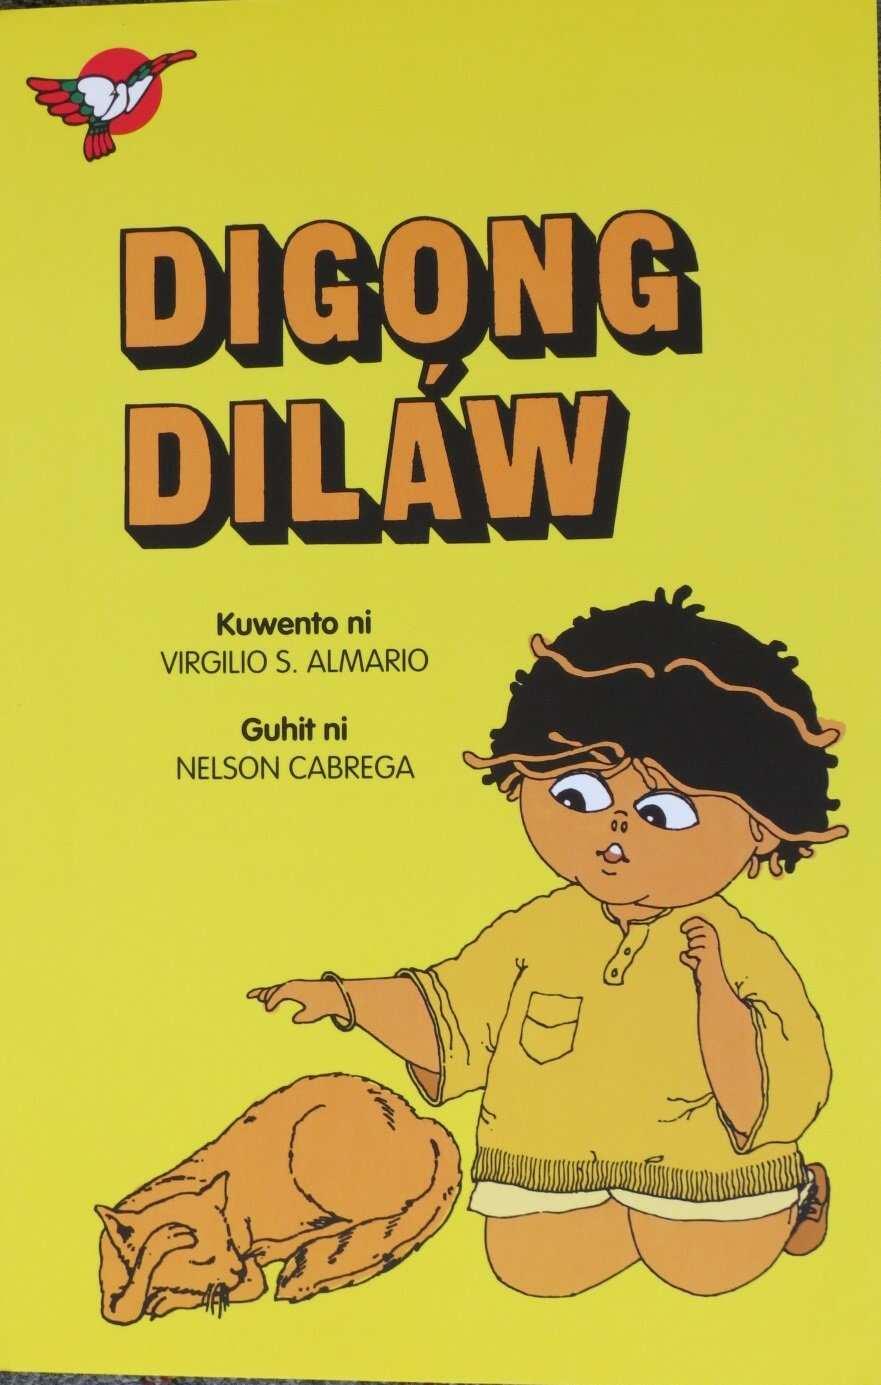 Ansabe?! VP Leni Robredo narrates the story of 'Digong Dilaw' to school kids